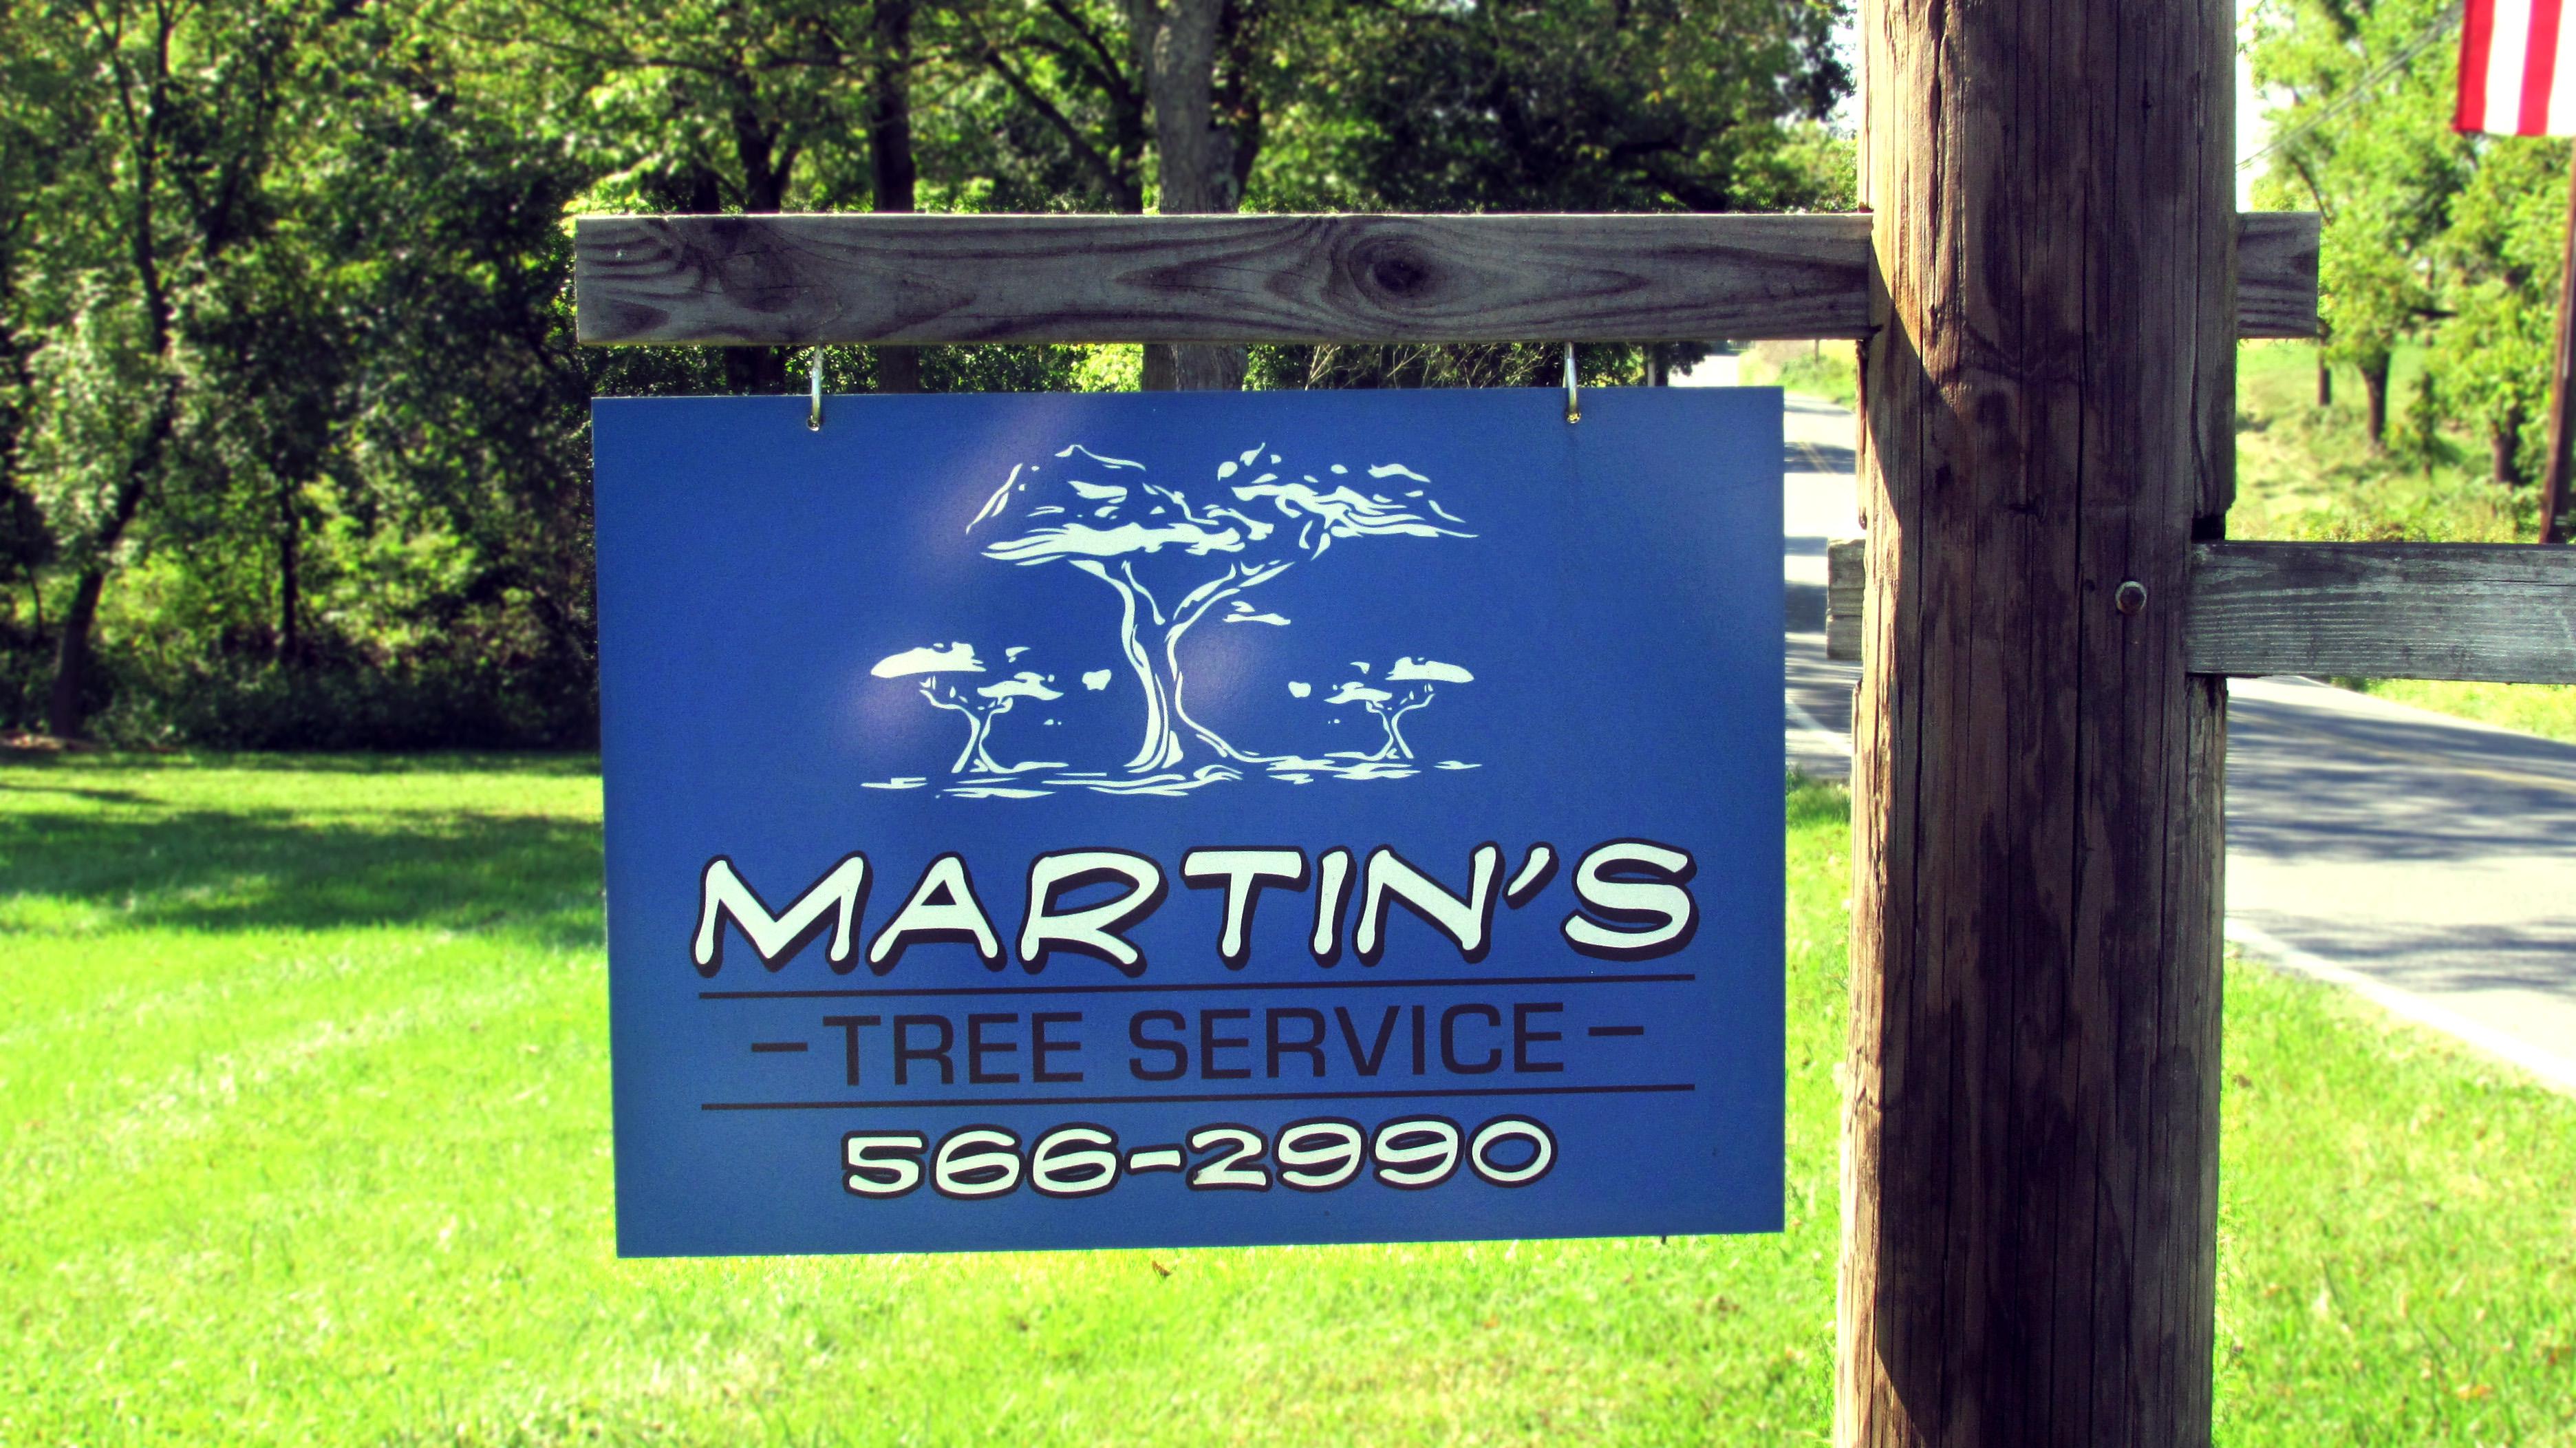 Martin's Tree Service Post Sign